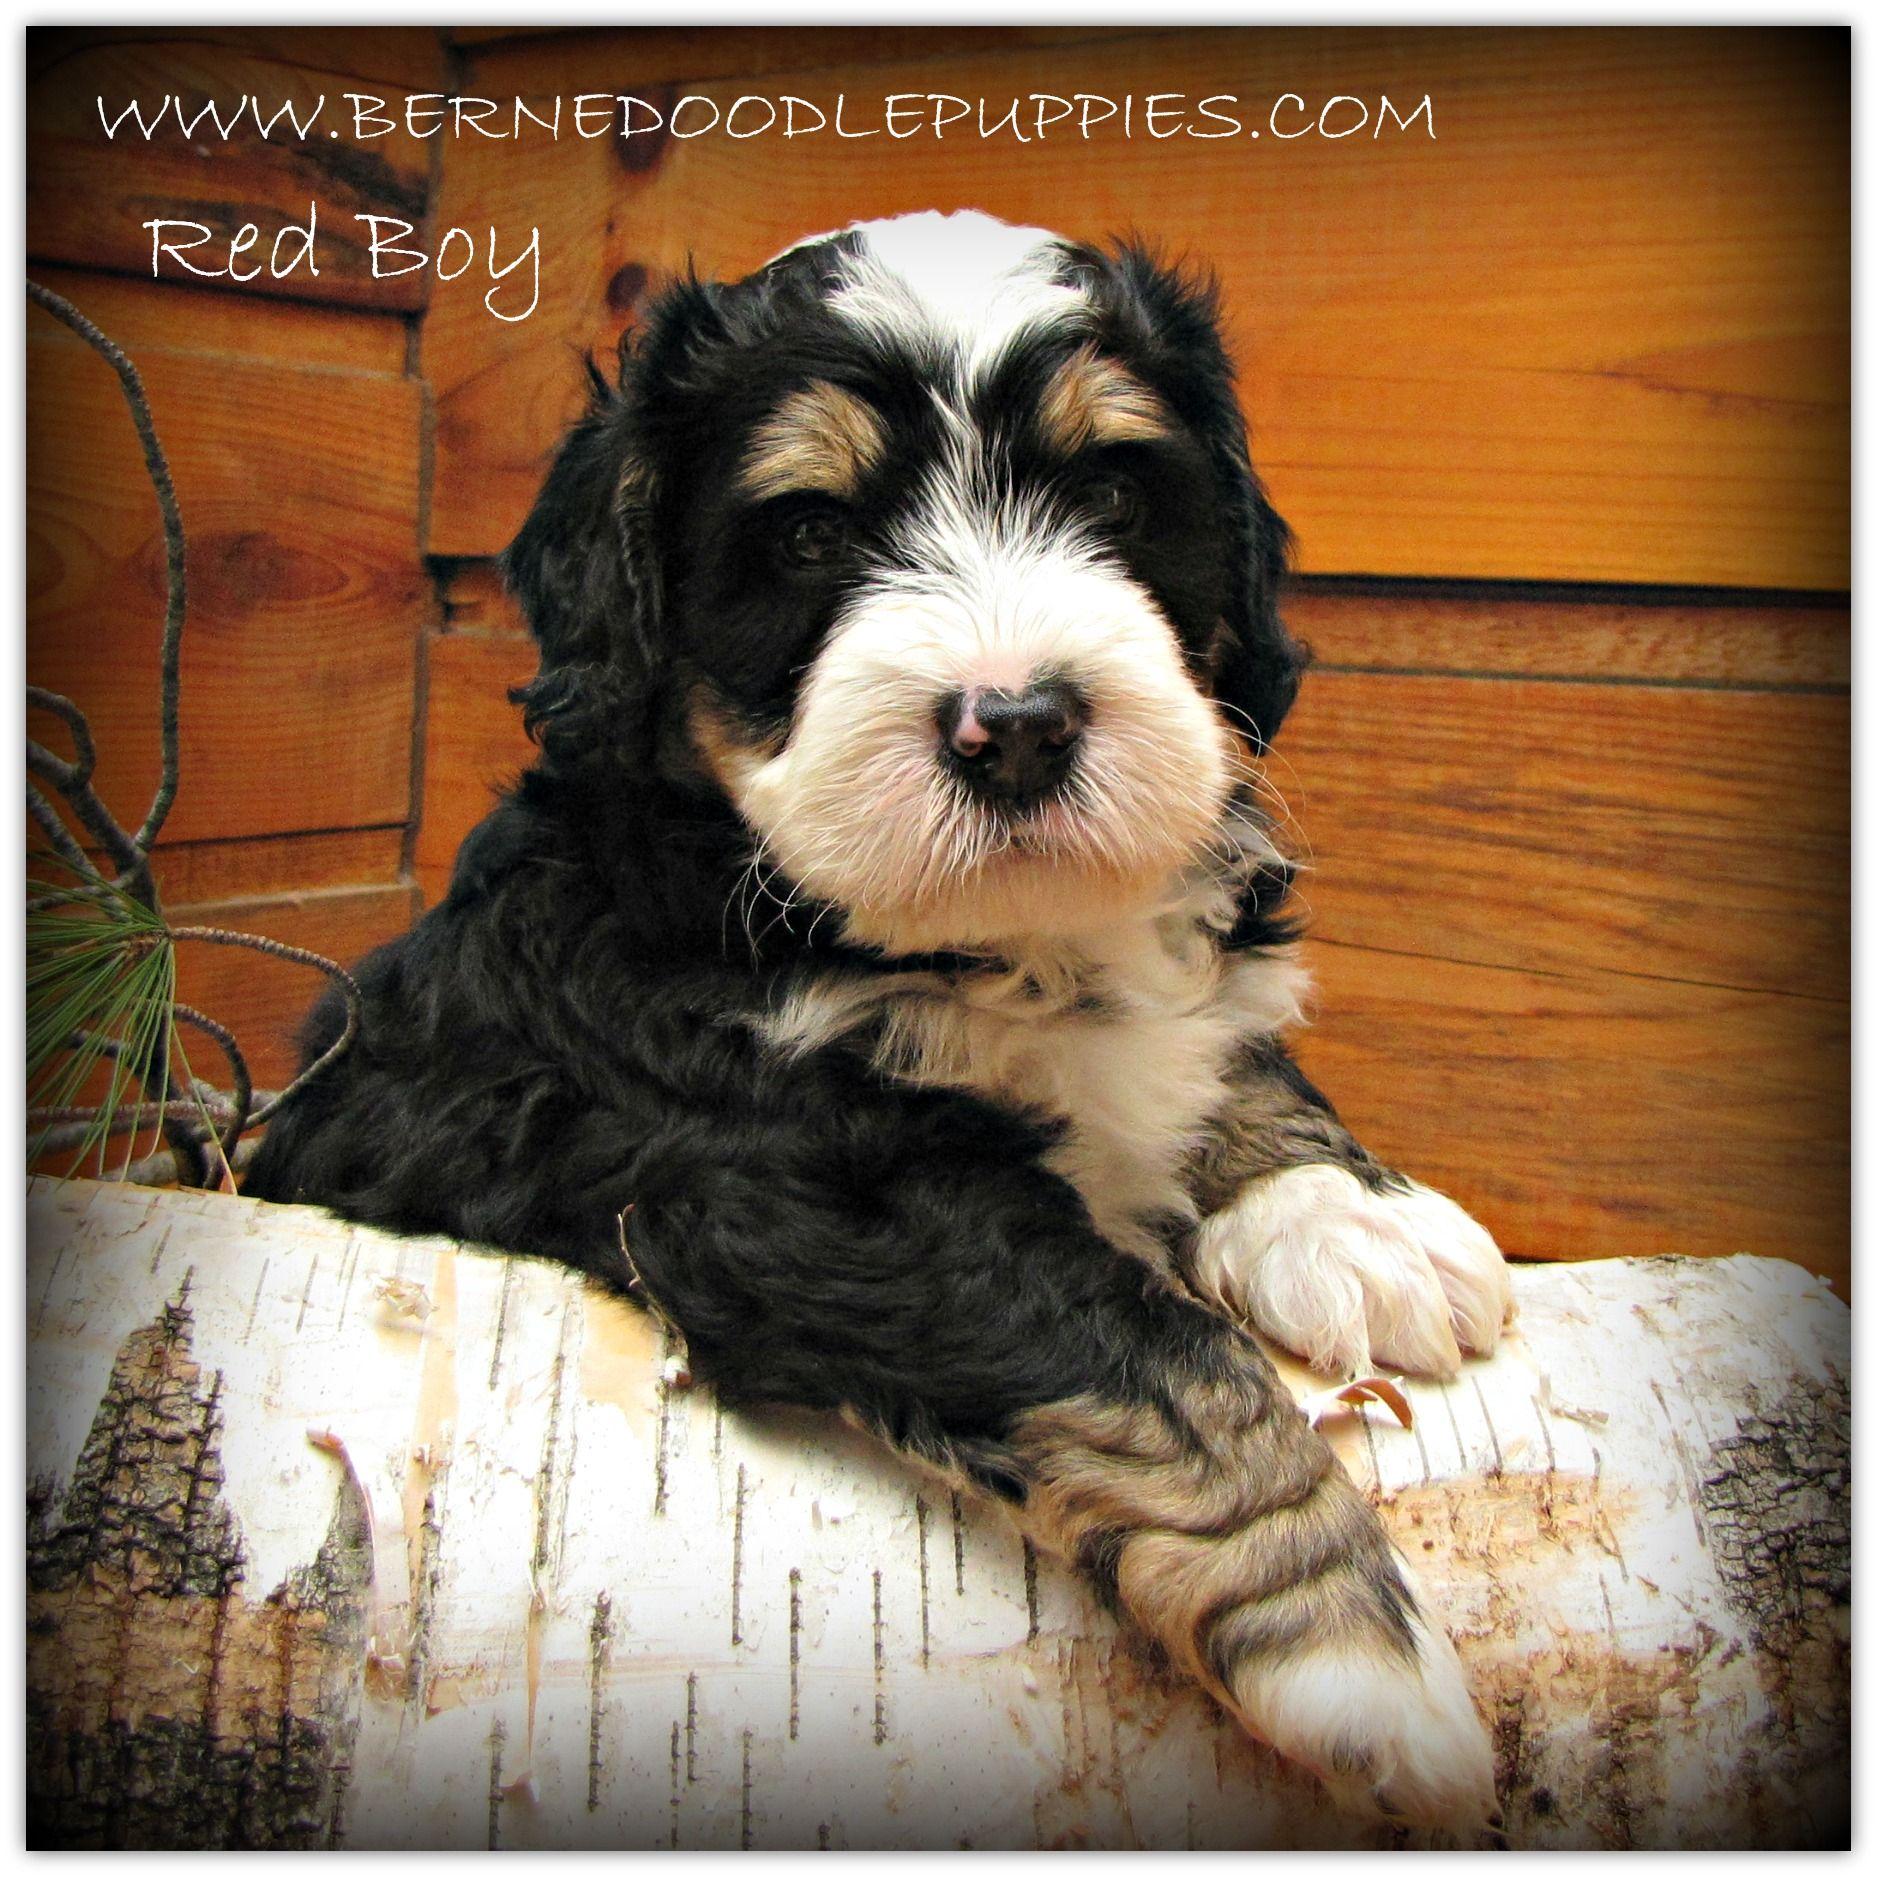 Wwwbernedoodlepuppiescom Red Boy A Bernedoodle Puppy At